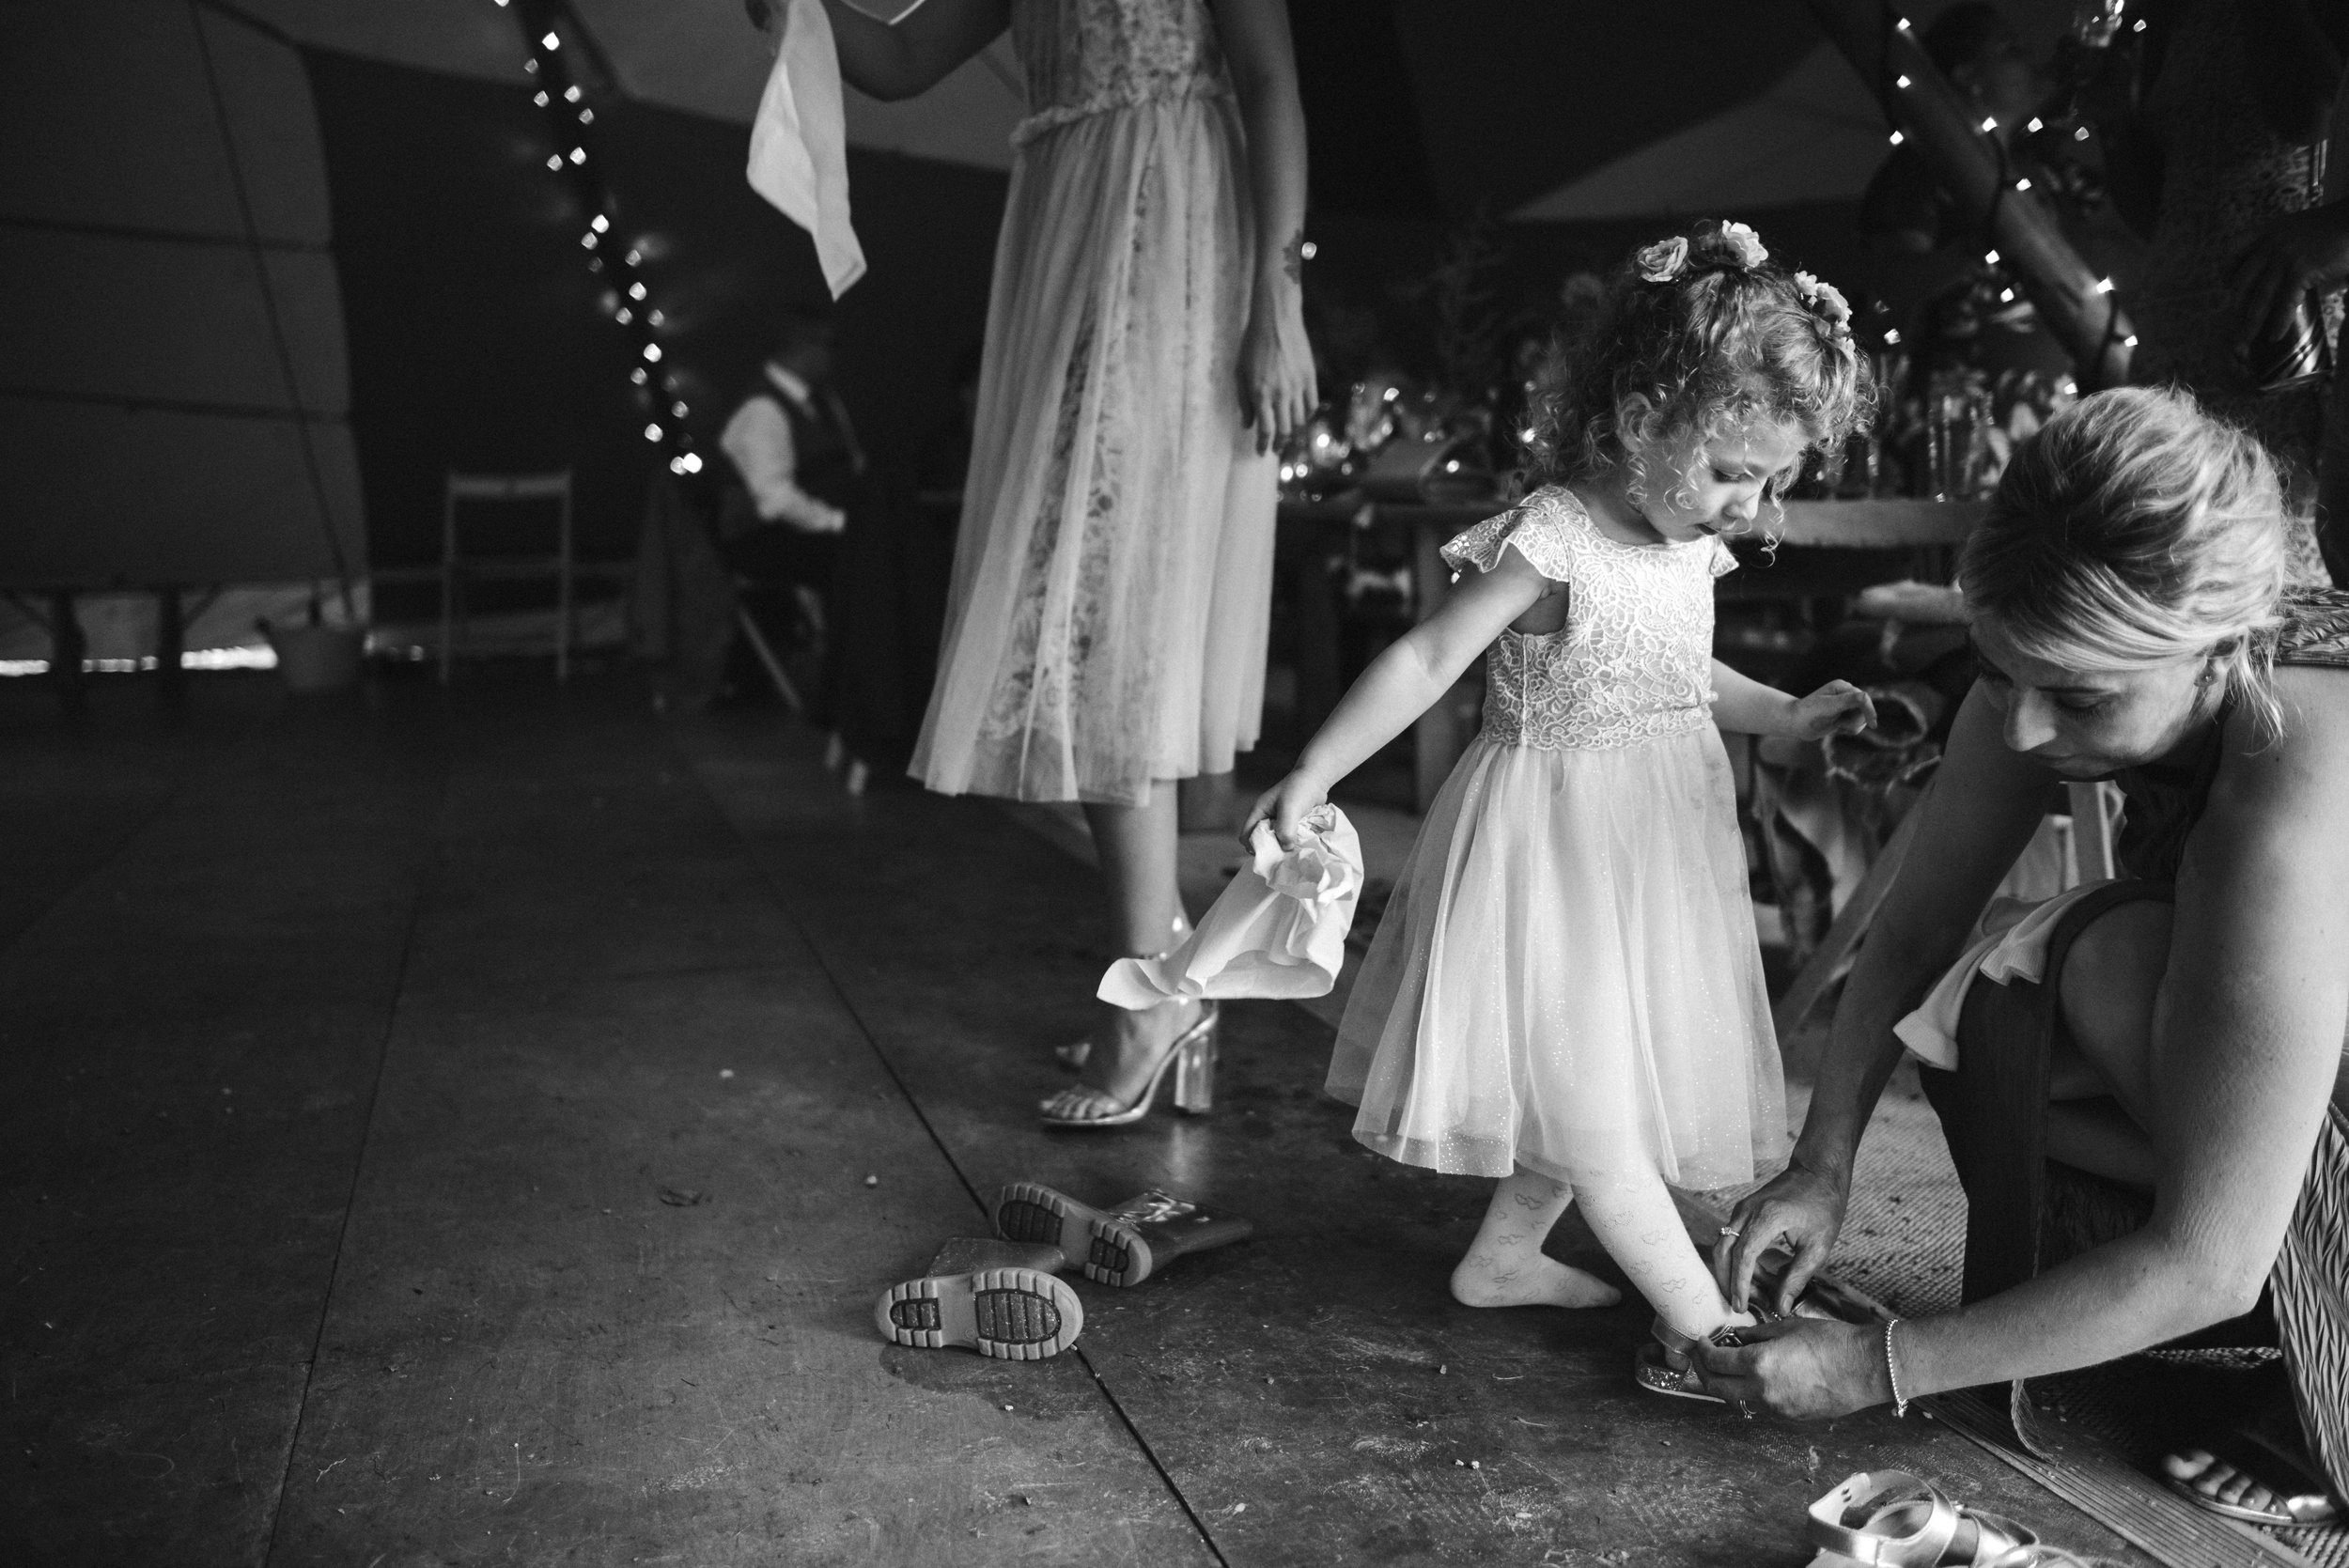 pengenna-manor-wedding-photographer-62.jpg